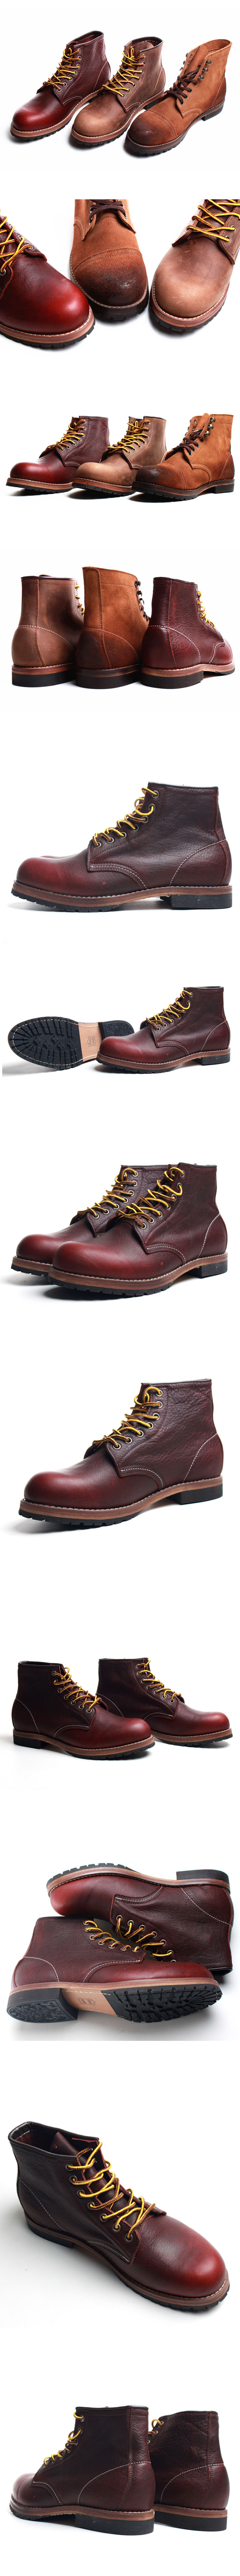 Martin boots men boots British style unisex autumn winter fashion  shoes